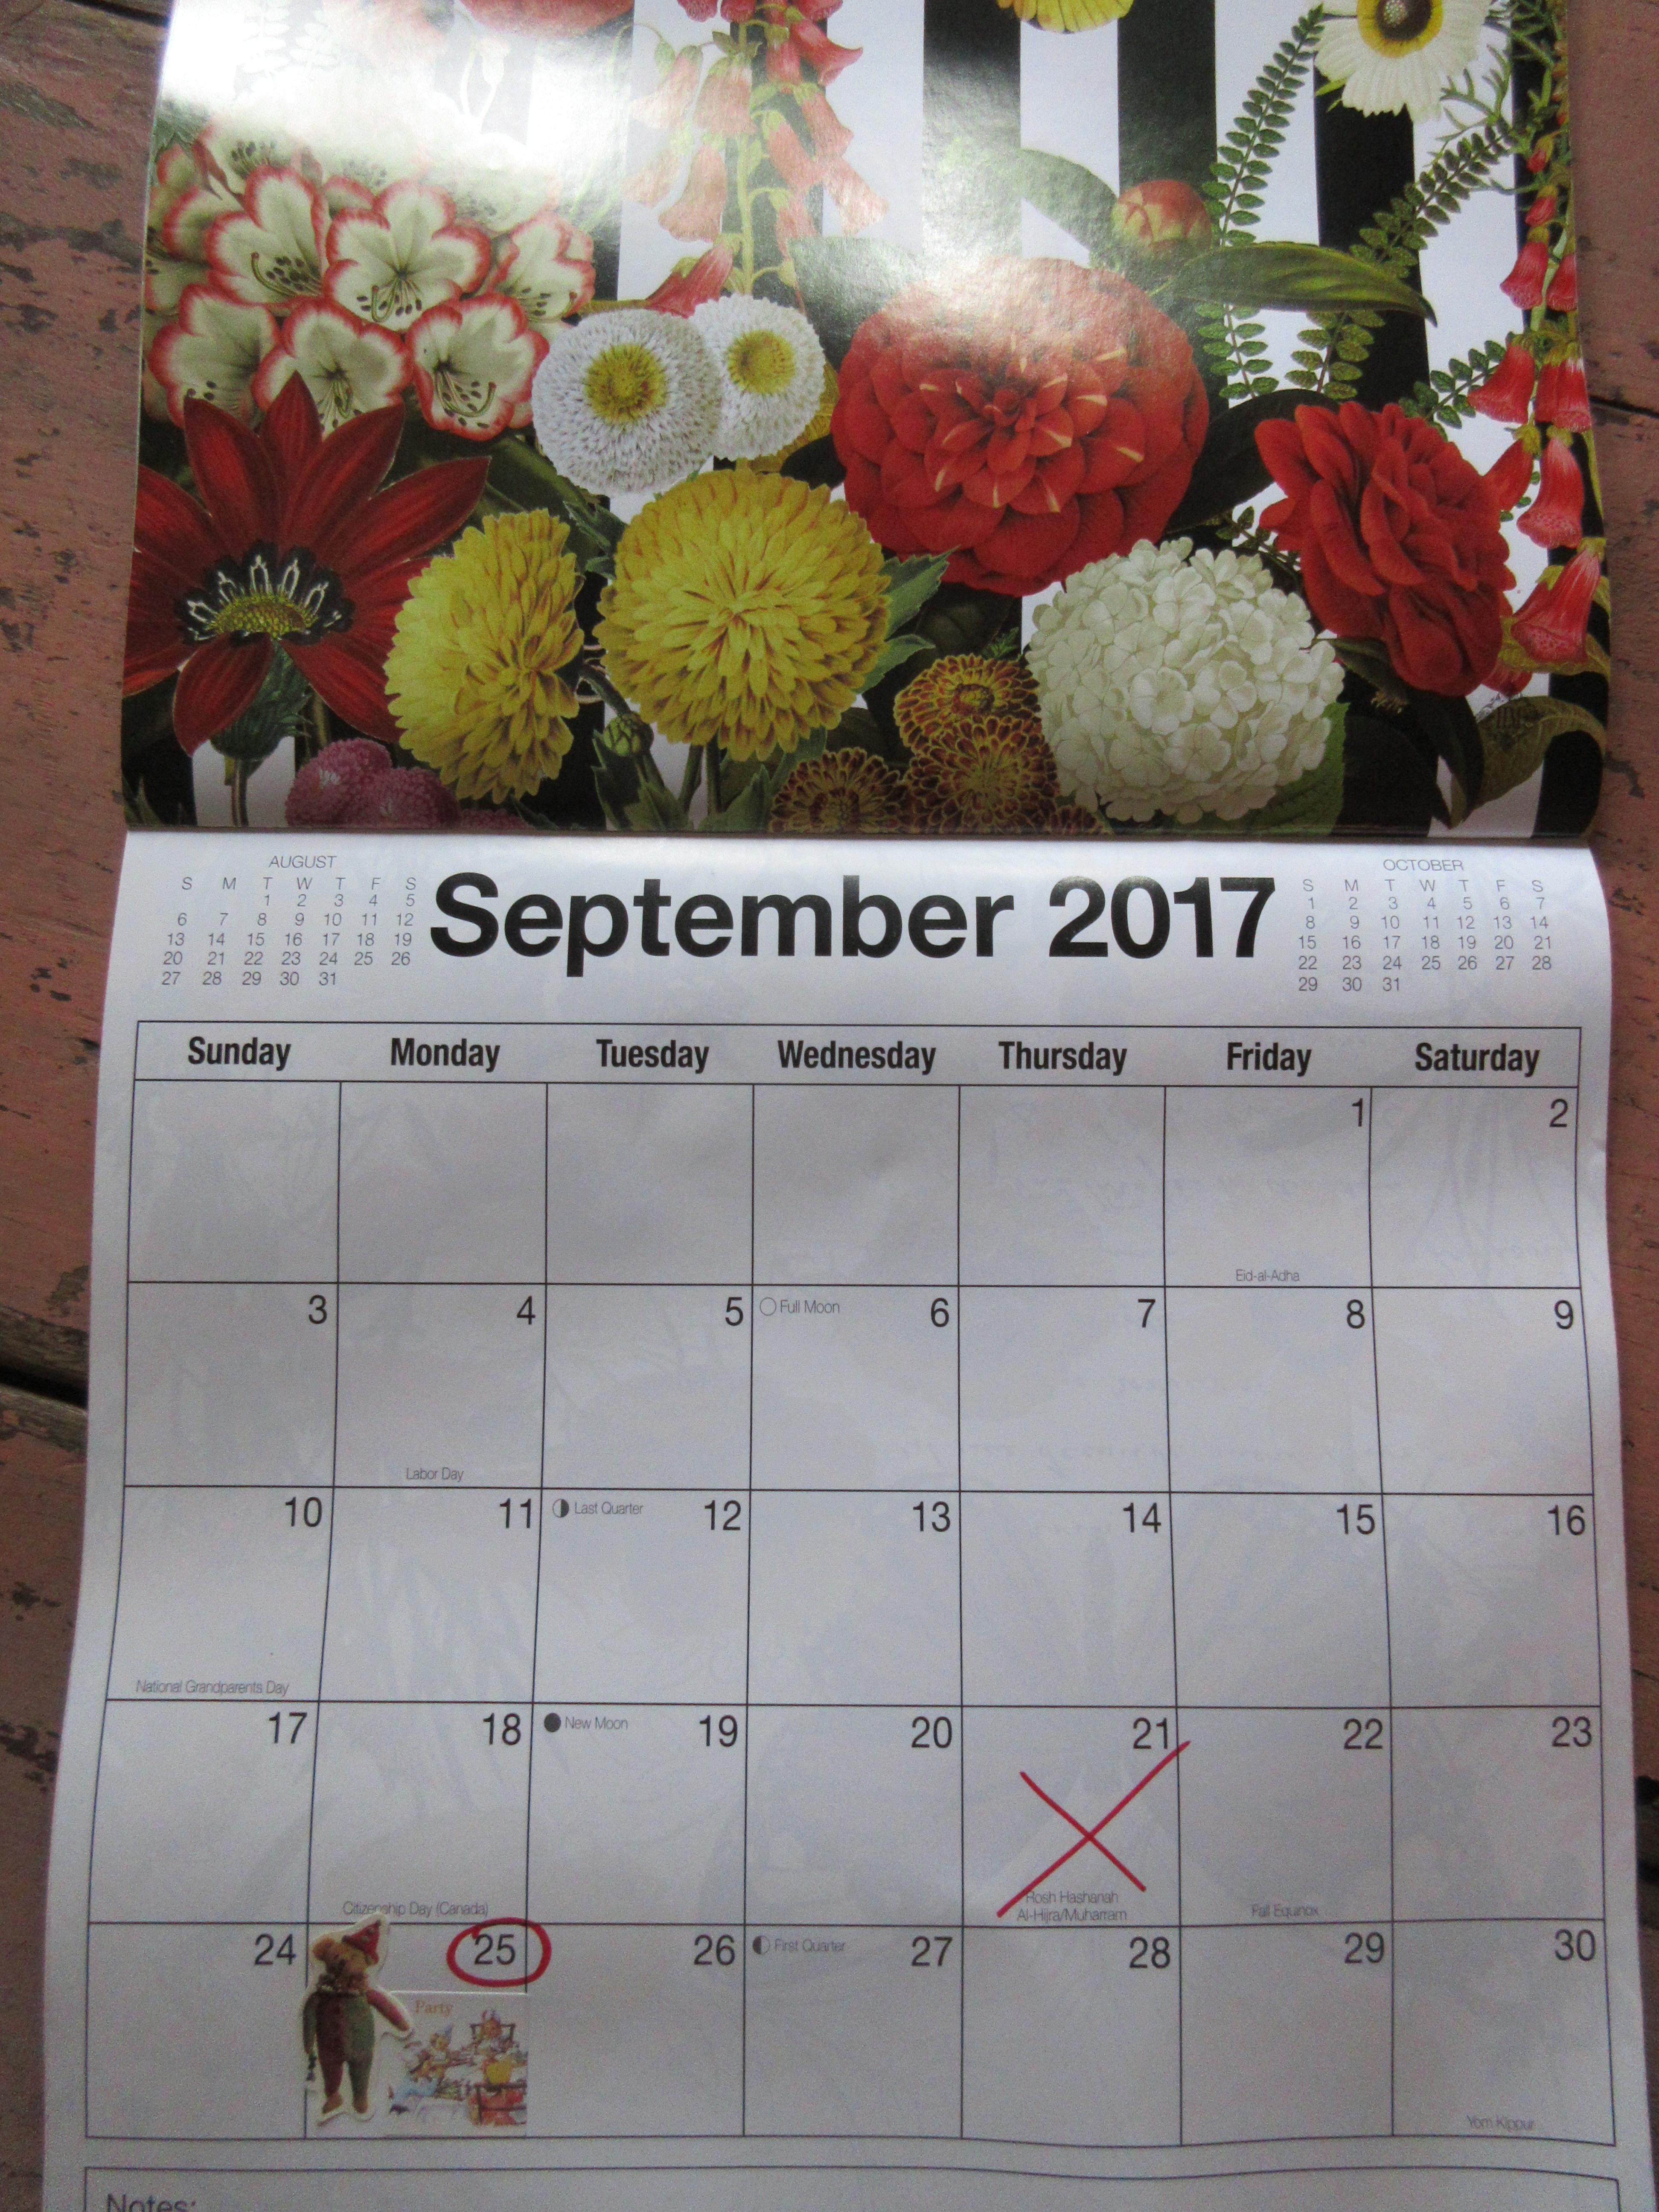 No Third Thursday in September